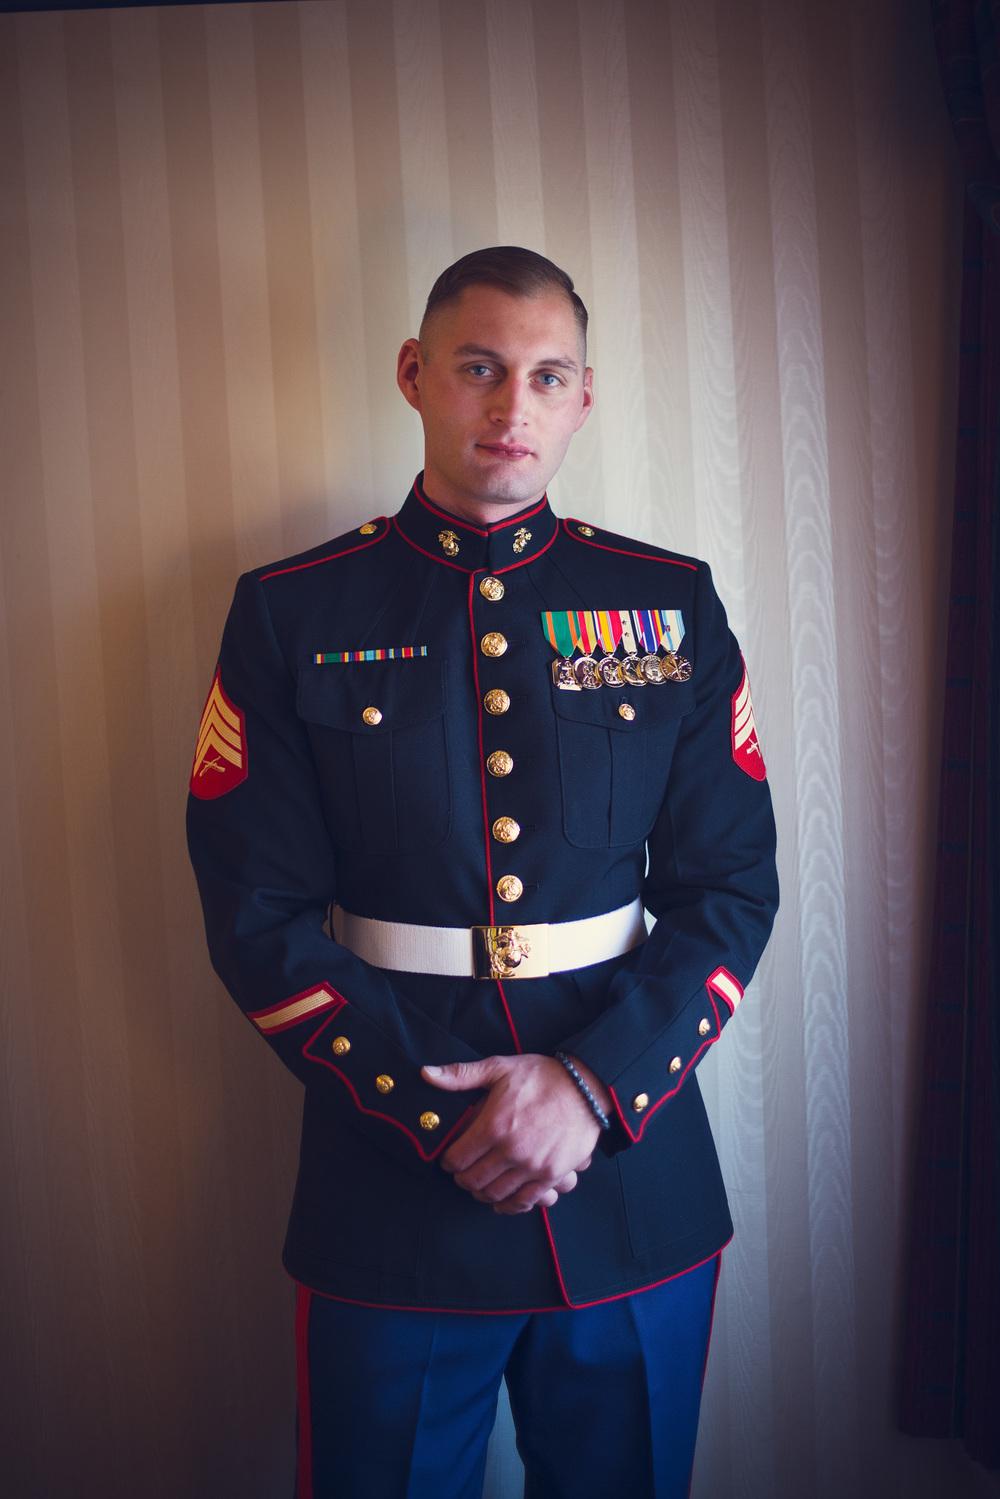 American Marine groom medals window light portrait THPHOTO